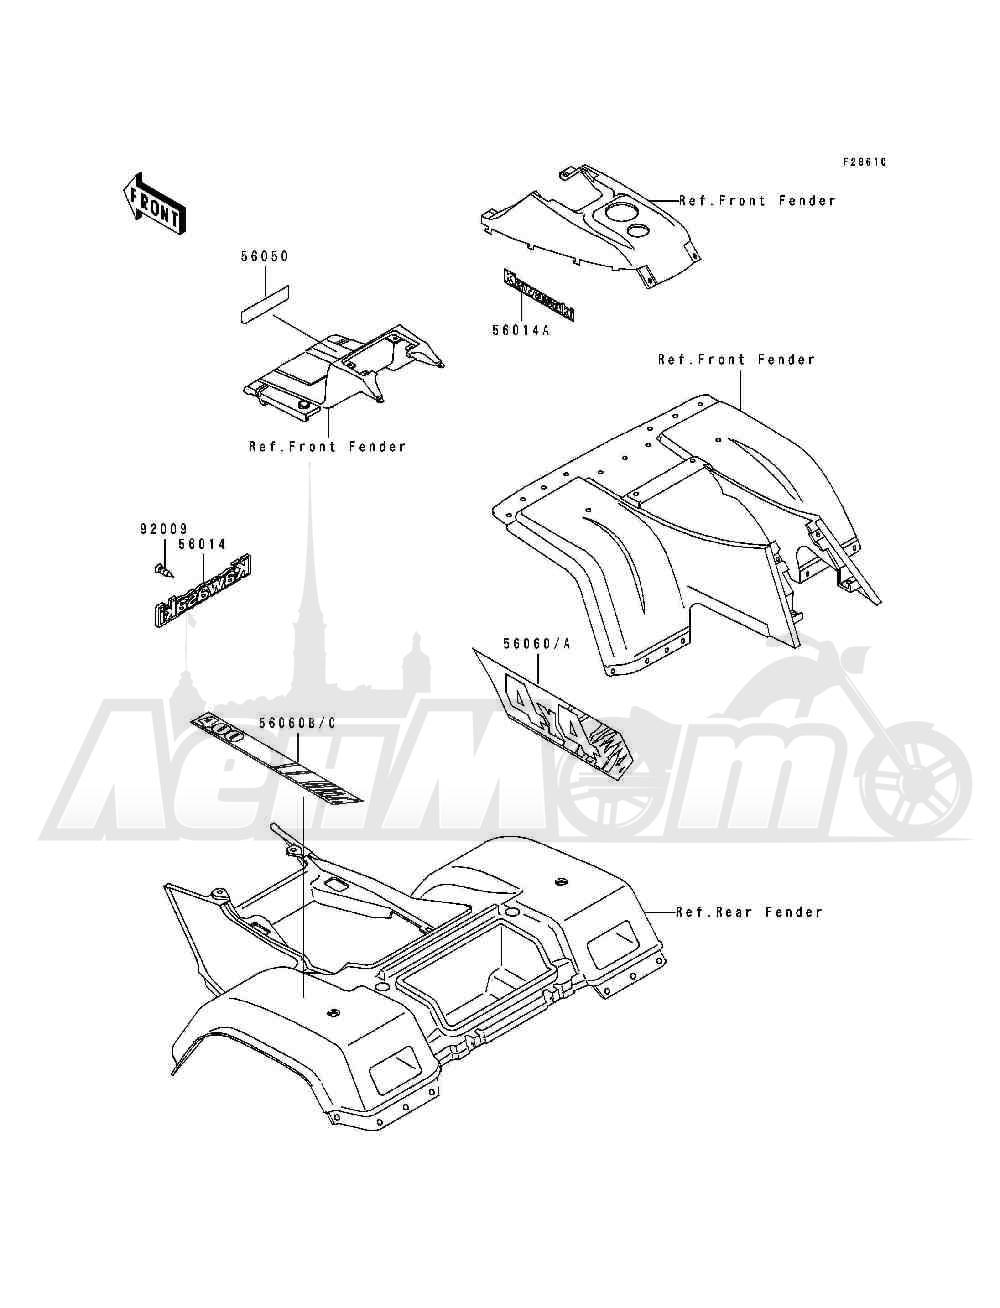 Запчасти для Квадроцикла Kawasaki 1994 BAYOU 400 4X4 (KLF400-B2) Раздел: DECALS(GRAY)(KLF400-B2)   наклейки (серый) (KLF400 B2)